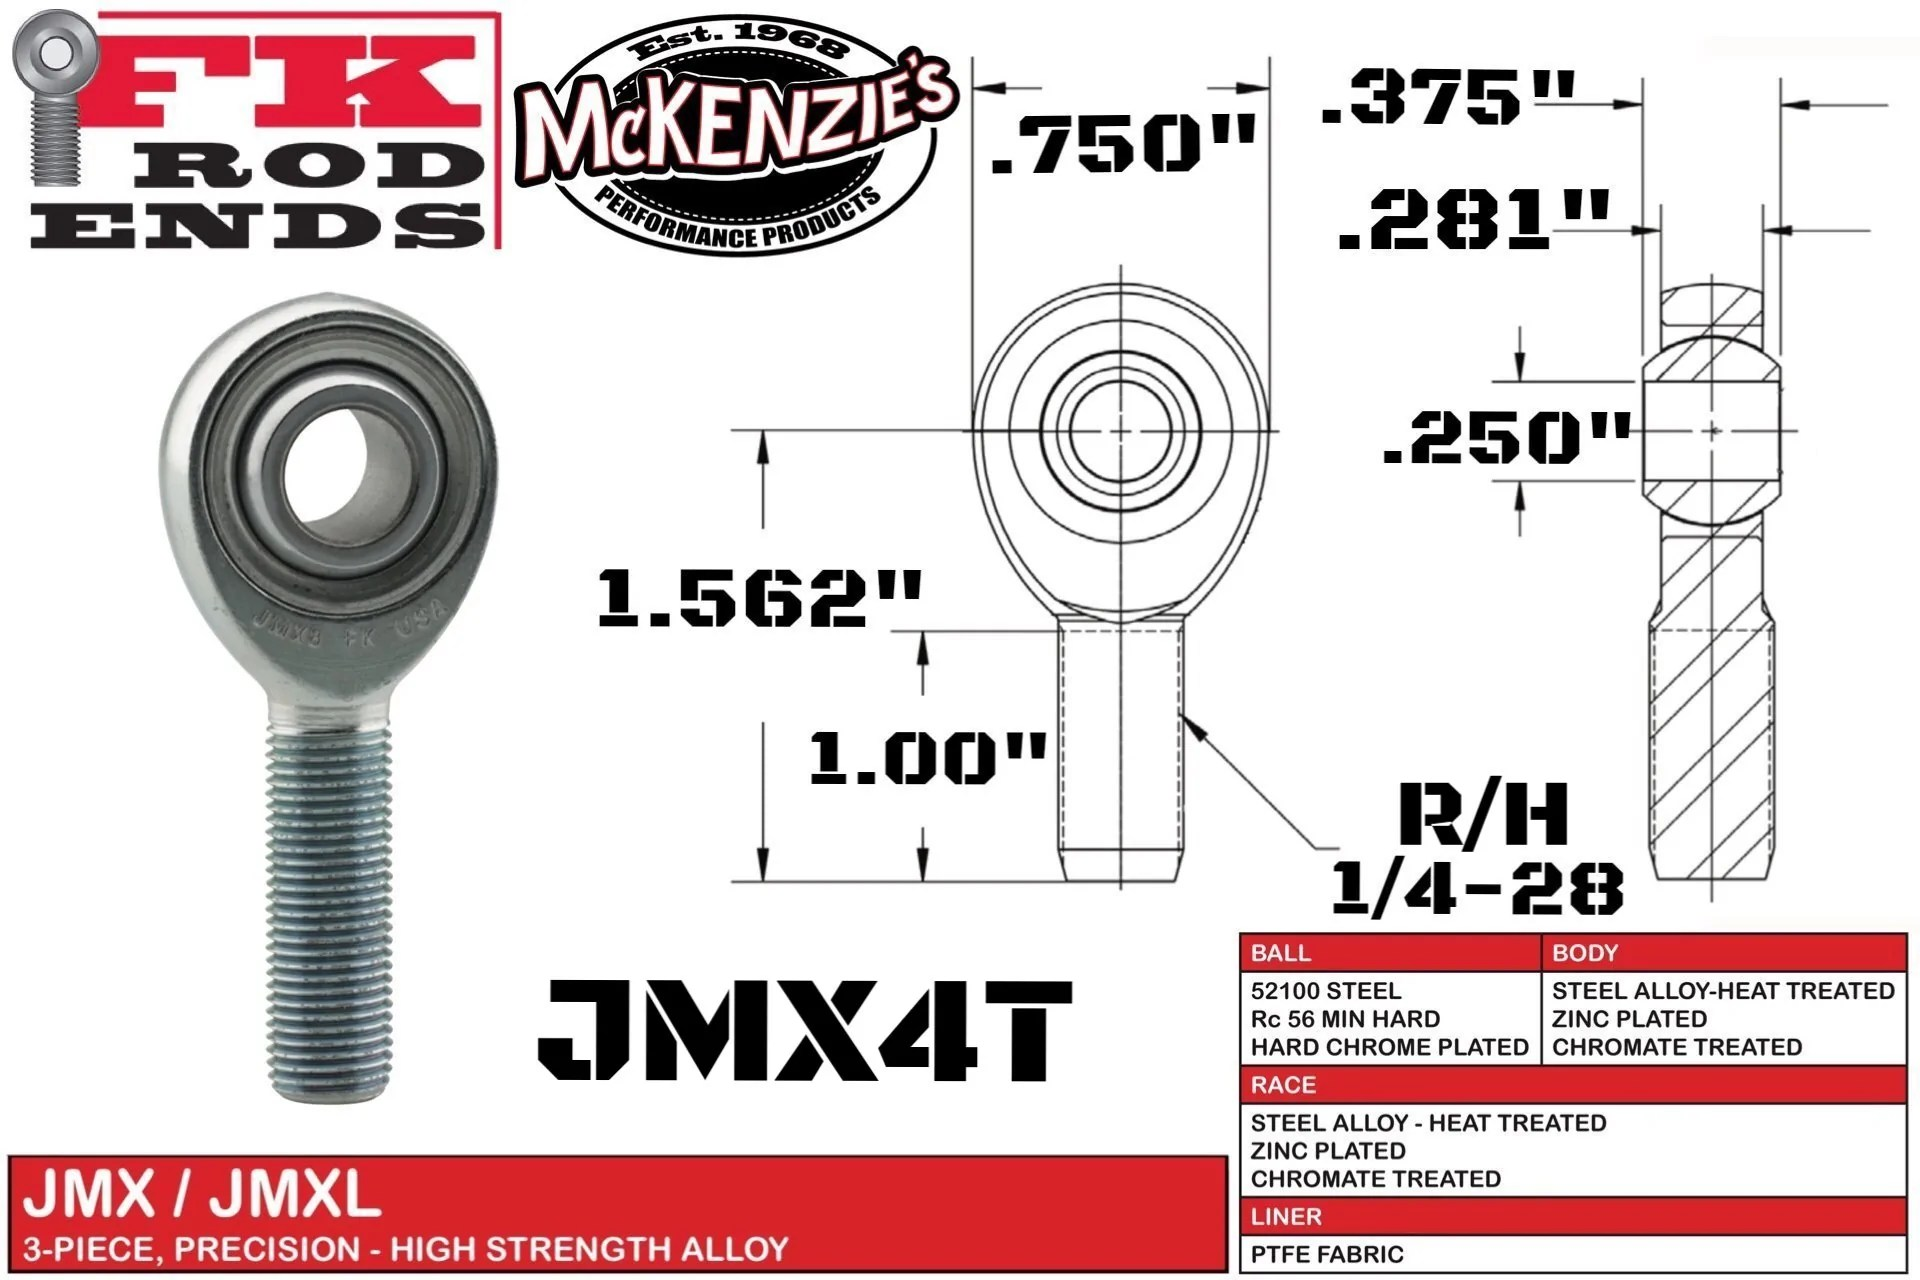 small resolution of jmx4t male r h heim 1 4 28 thread 250 ball fk bearing